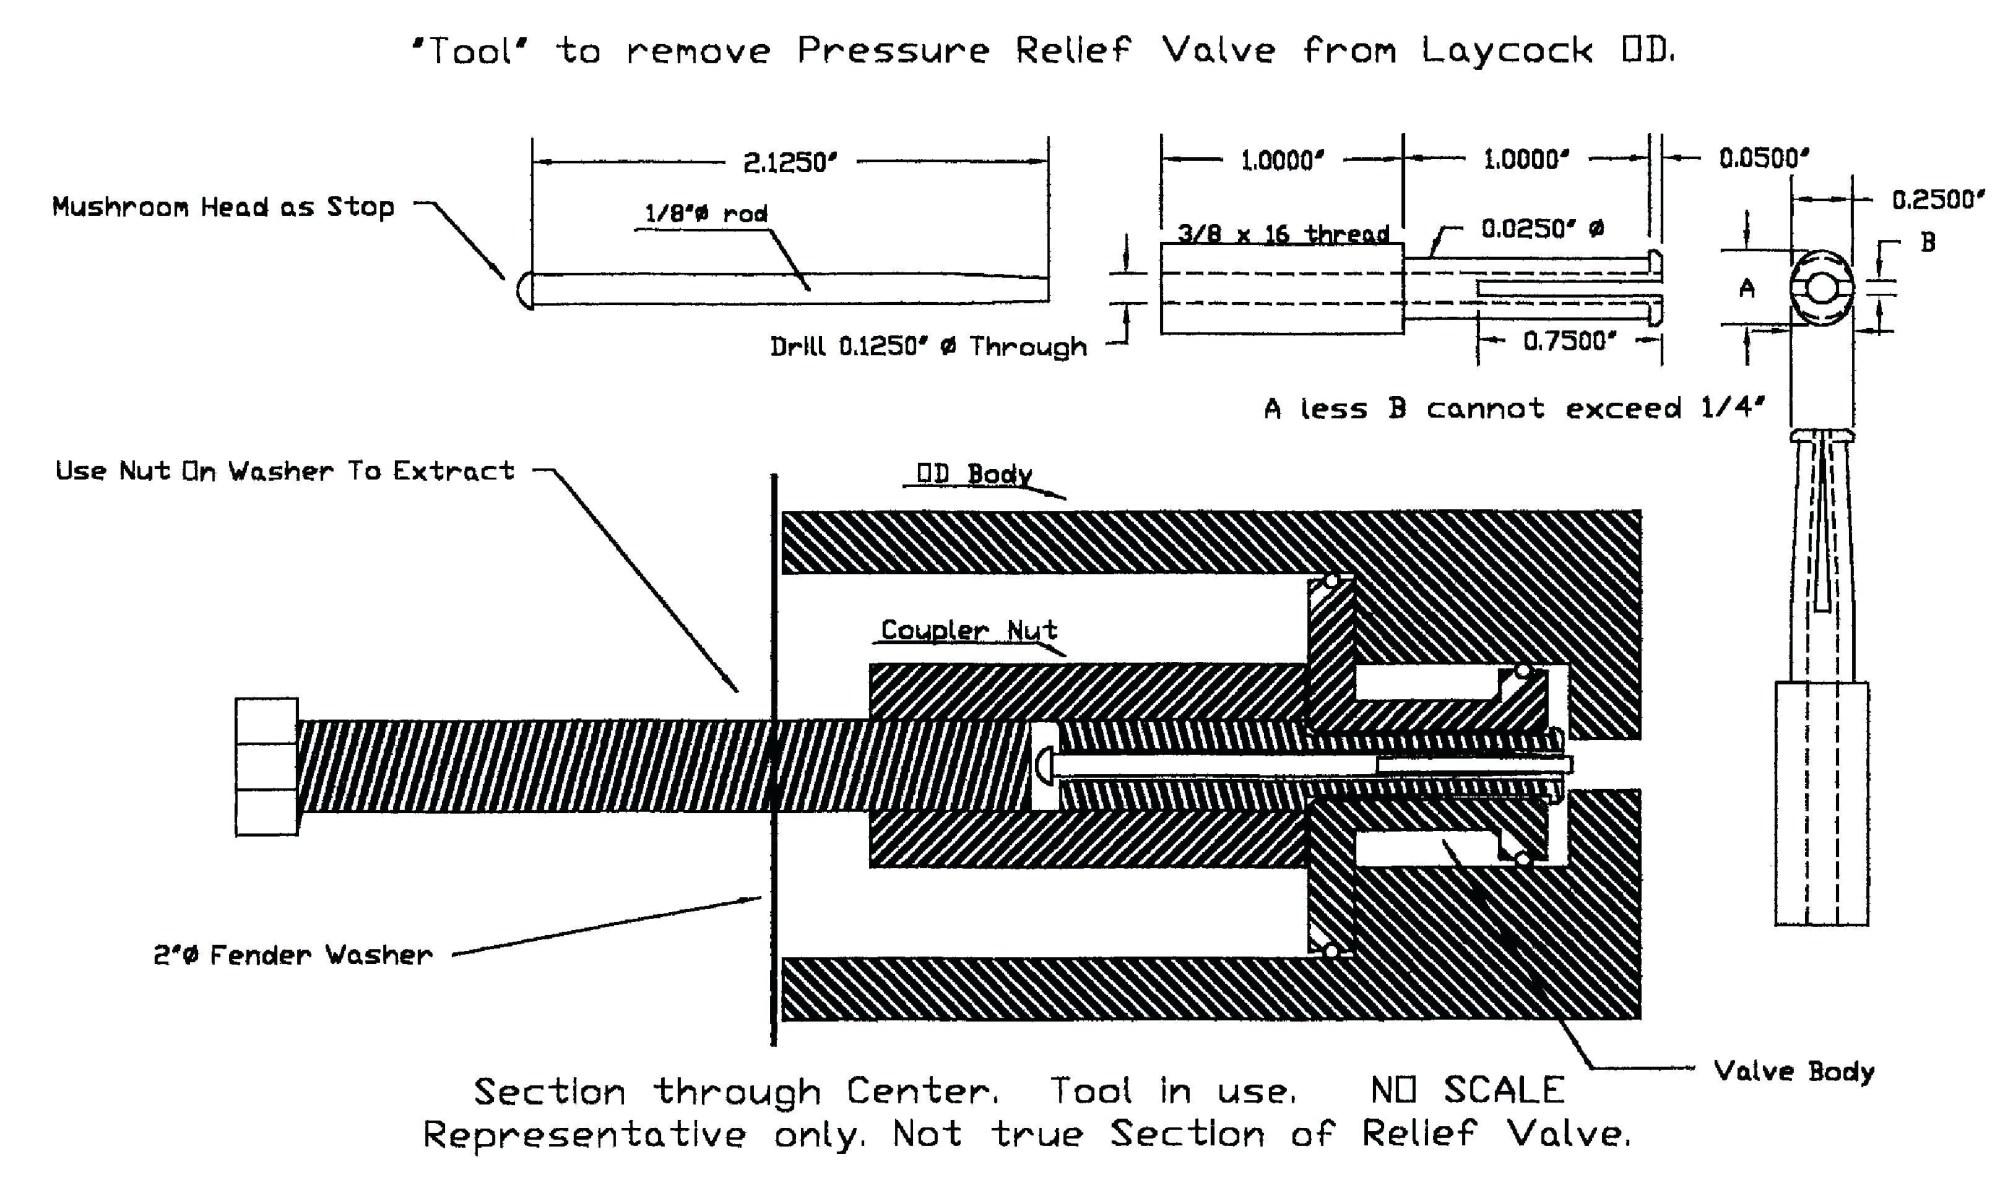 hight resolution of 1980 yamaha xs1100 wiring diagram 1980 yamaha xs1100 wiring diagram valid yamaha sd controller wiring of